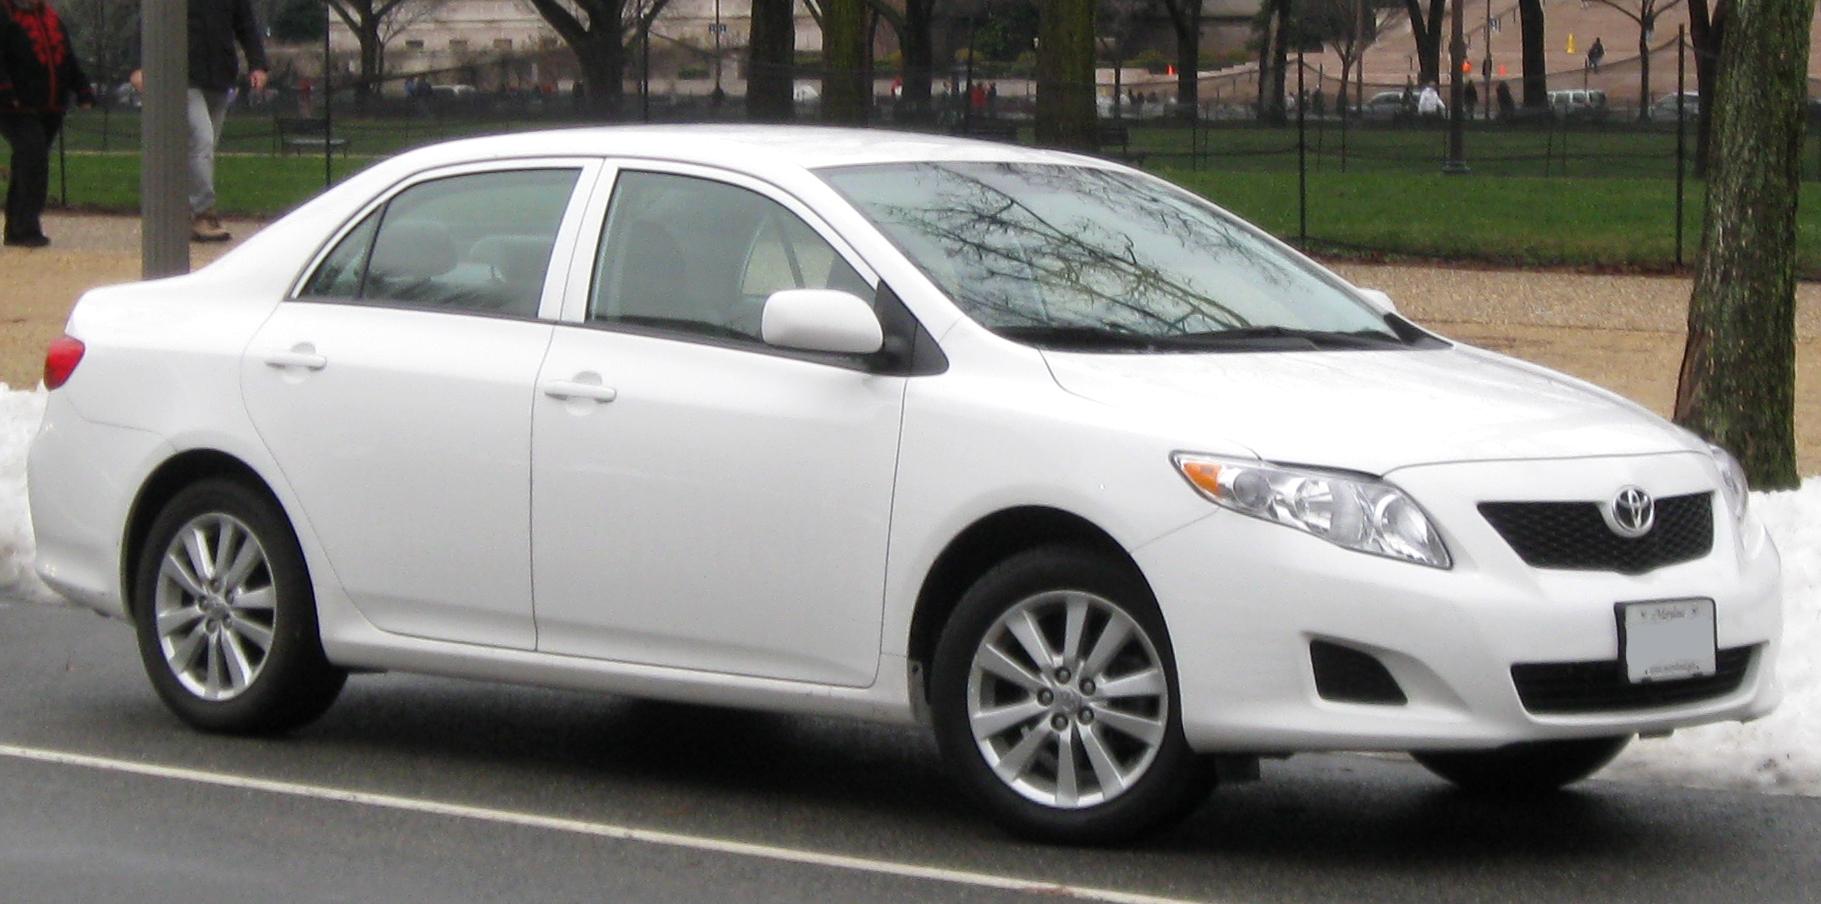 File:Toyota Corolla LE -- 12-26-2009.jpg - Wikimedia Commons